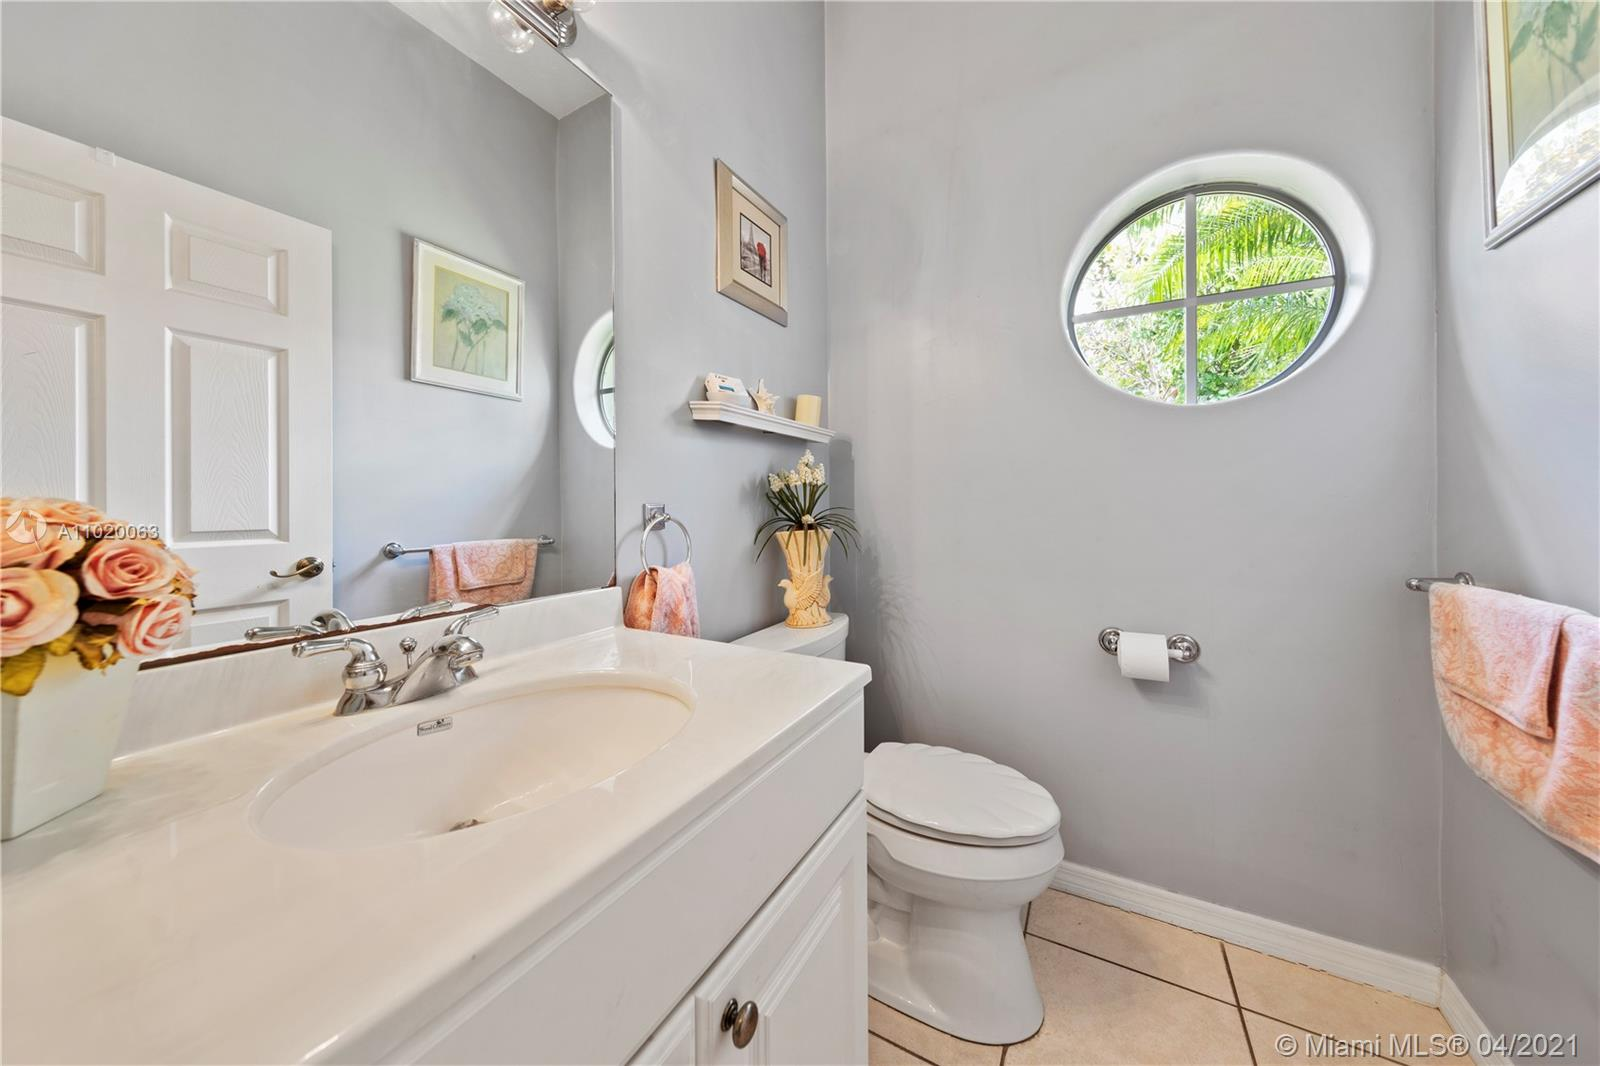 POOL HOUSE BATH